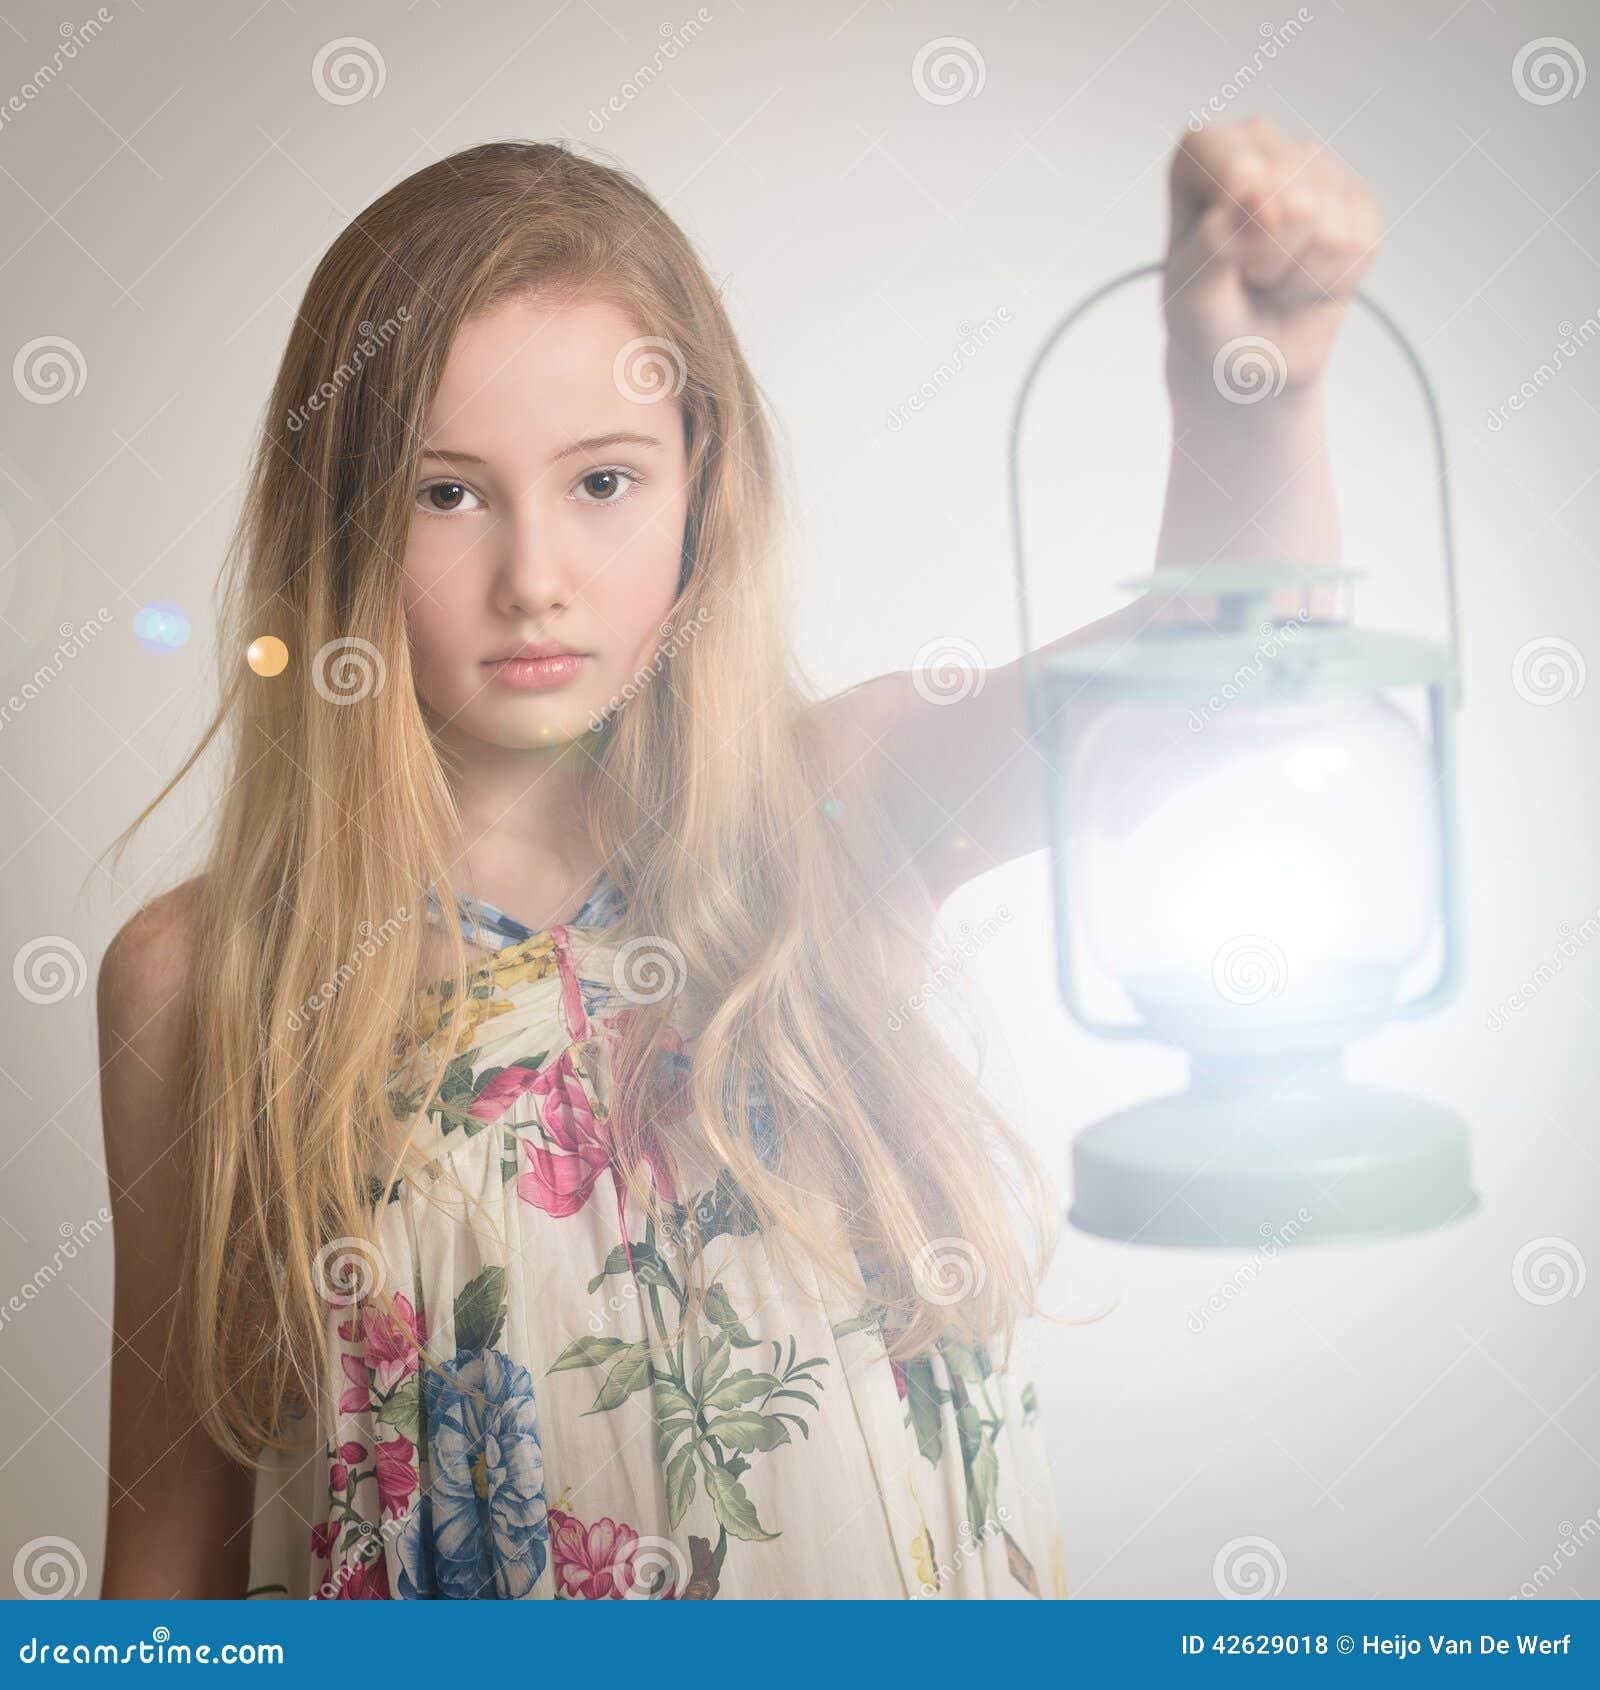 Blond Girl Holding A Lantern. Stock Photo - Image of lamp, hair ... for Girl Holding Lamp  104xkb